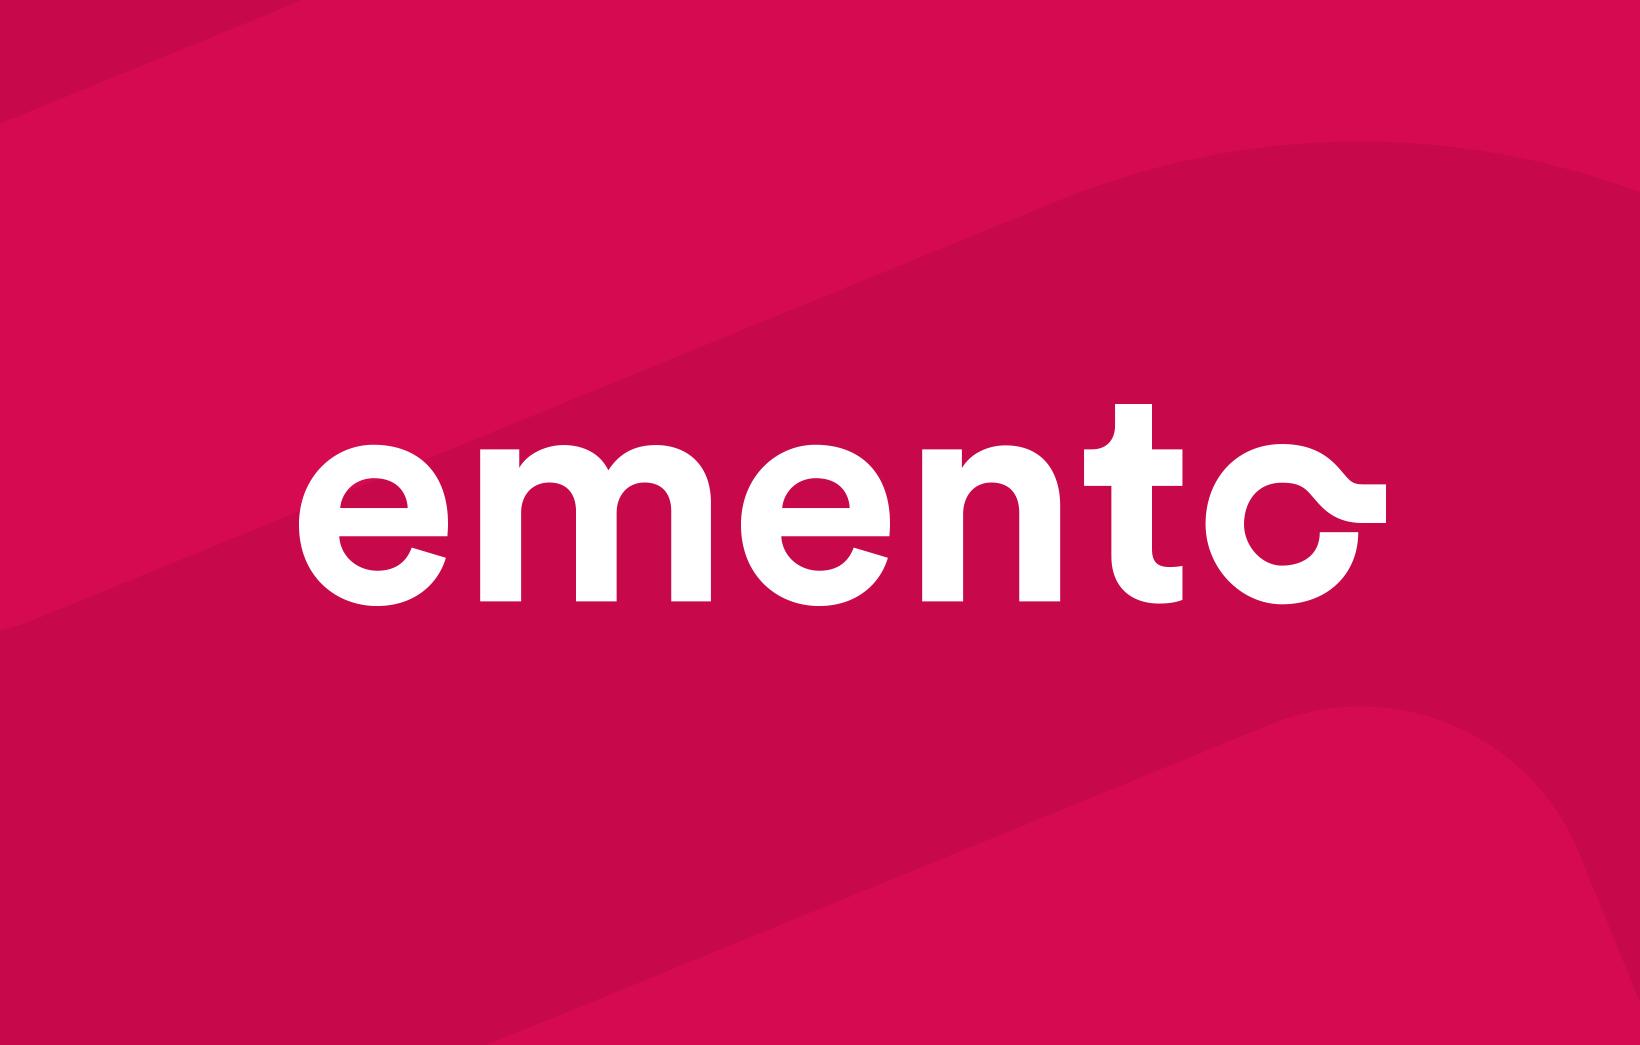 Template_emento